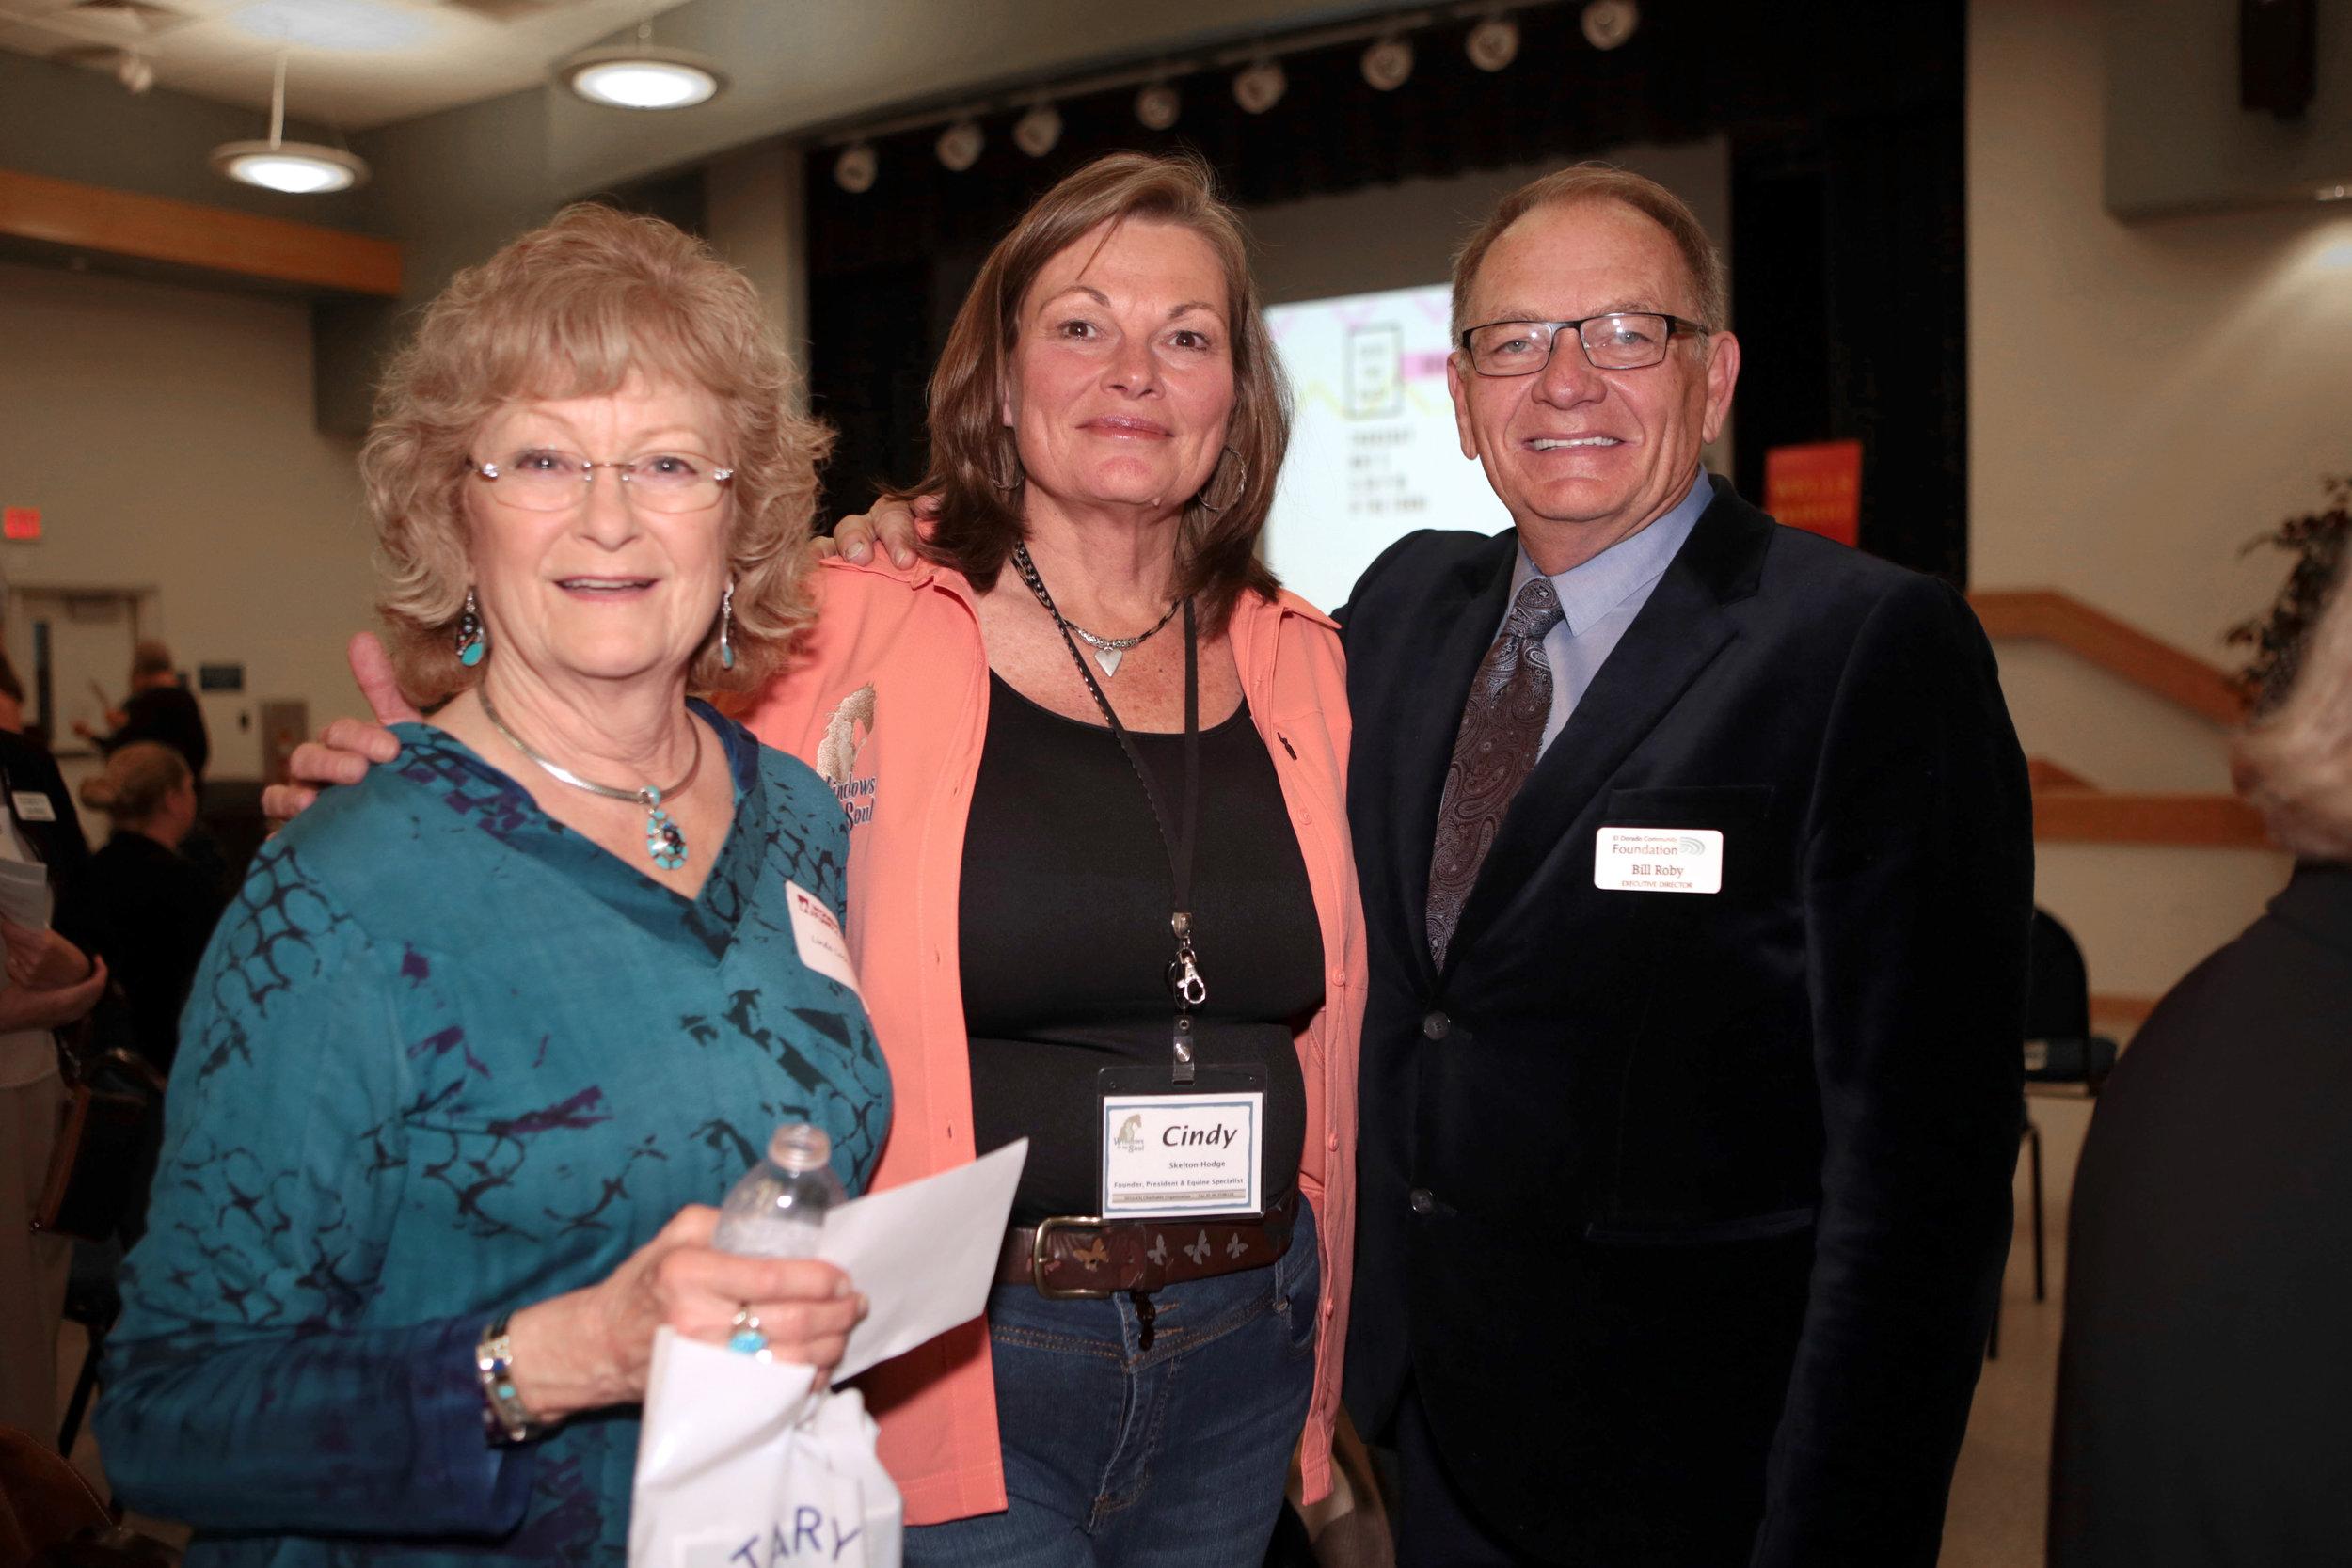 Left to Right: Linda Lockwood, Cindy Skelton-Hodge, Bill Roby.jpg